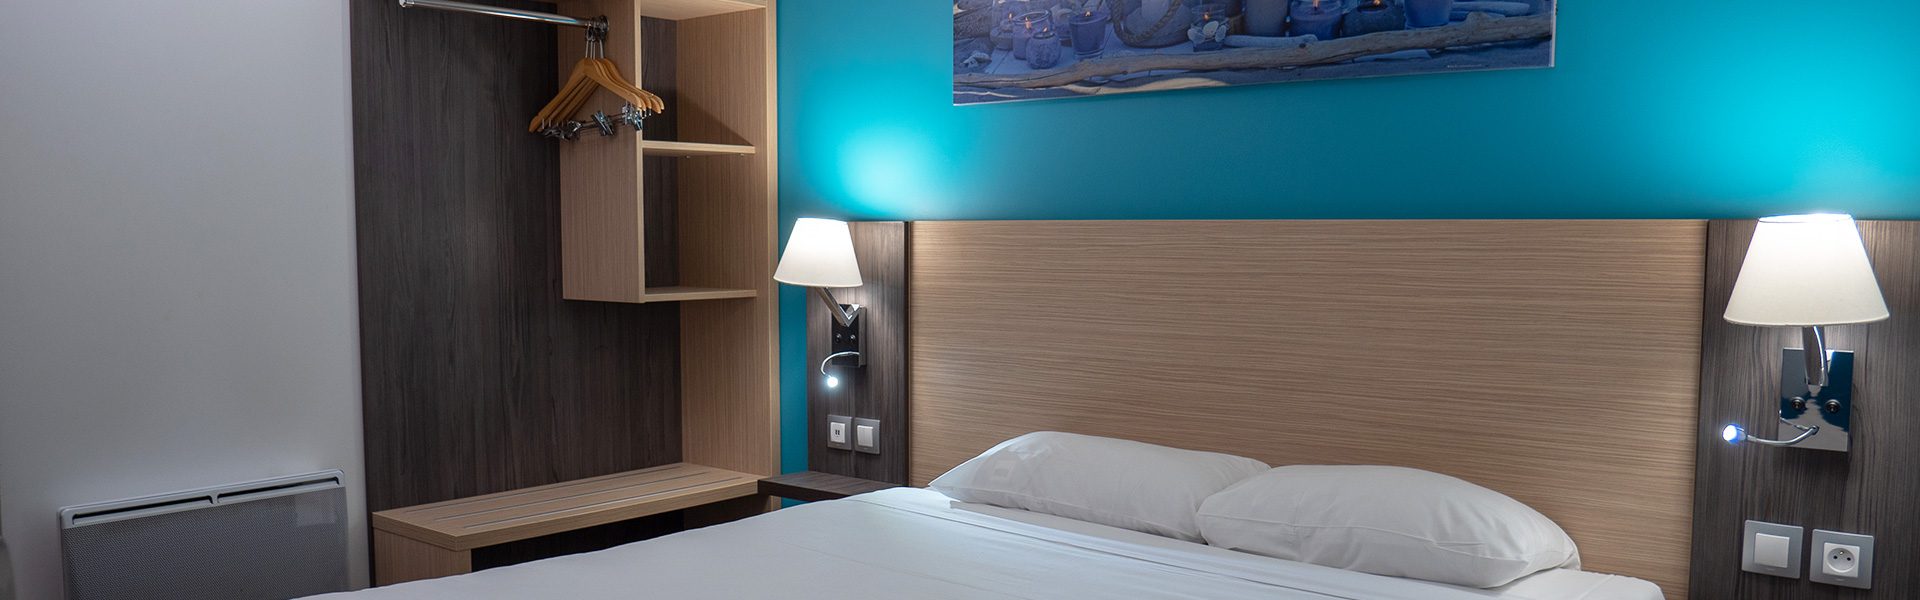 hotel_bleu_france_chambre_twin_bleu_1920x600